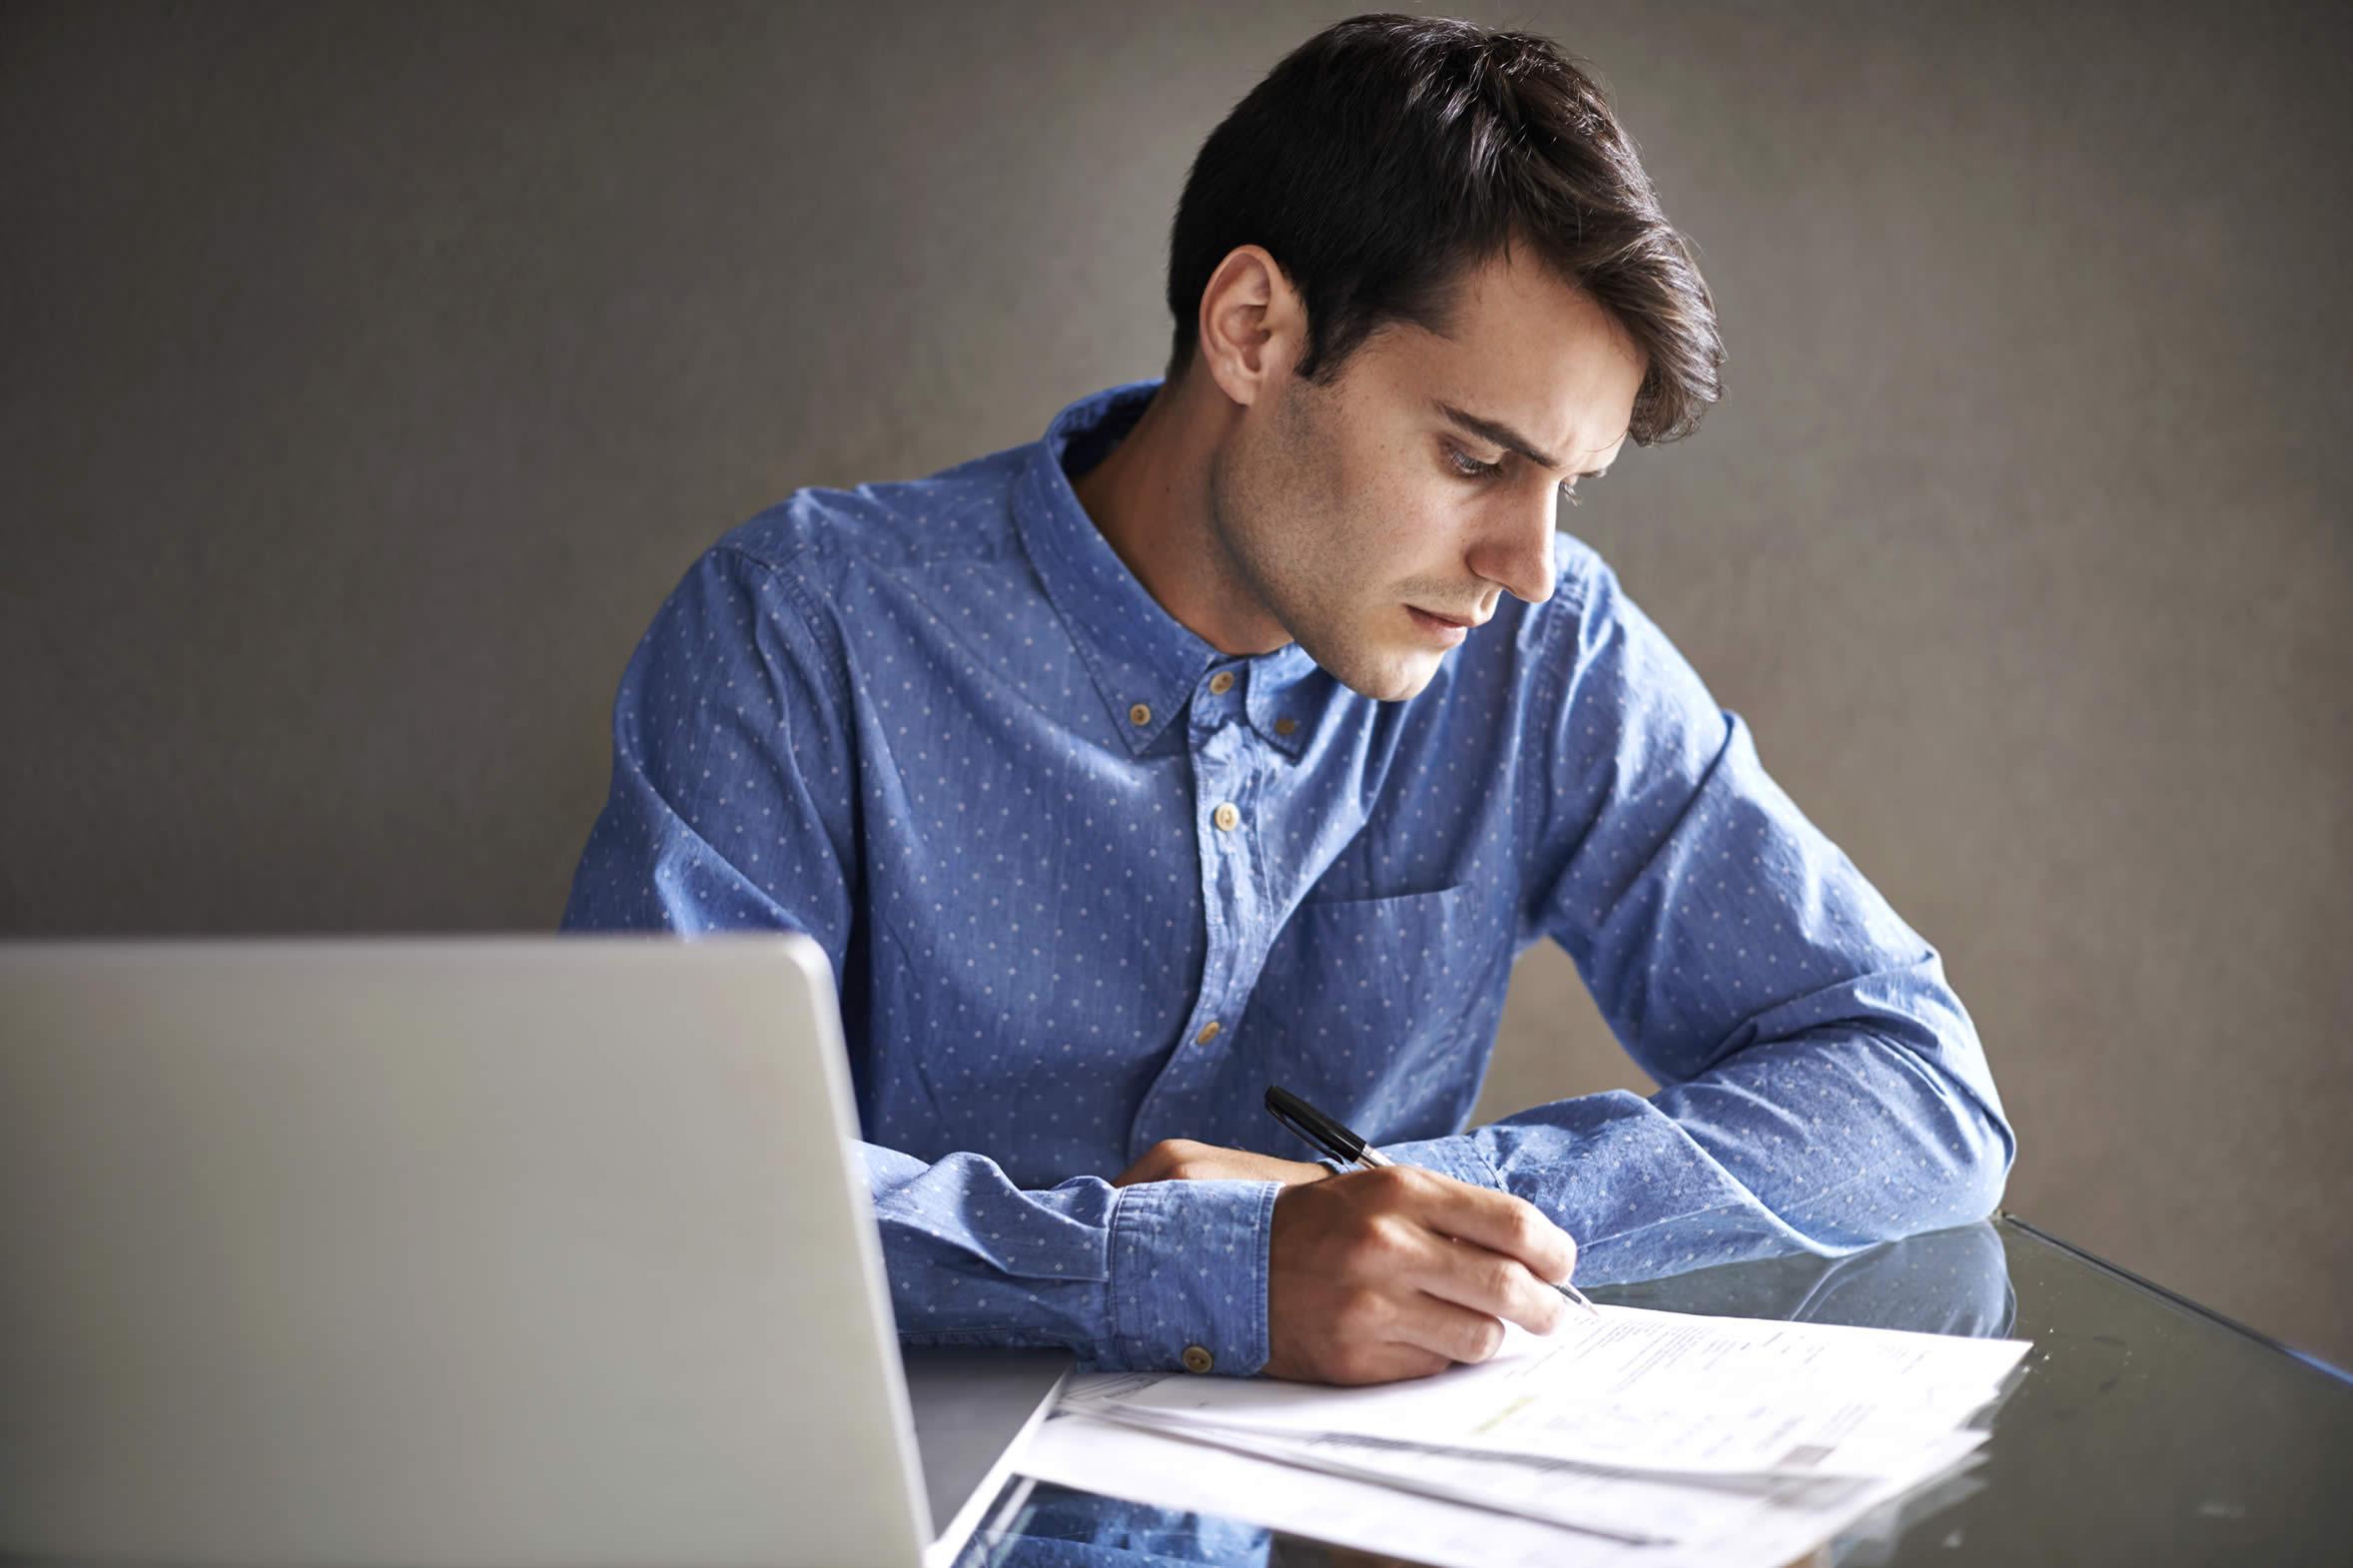 Dissertation korrektur com